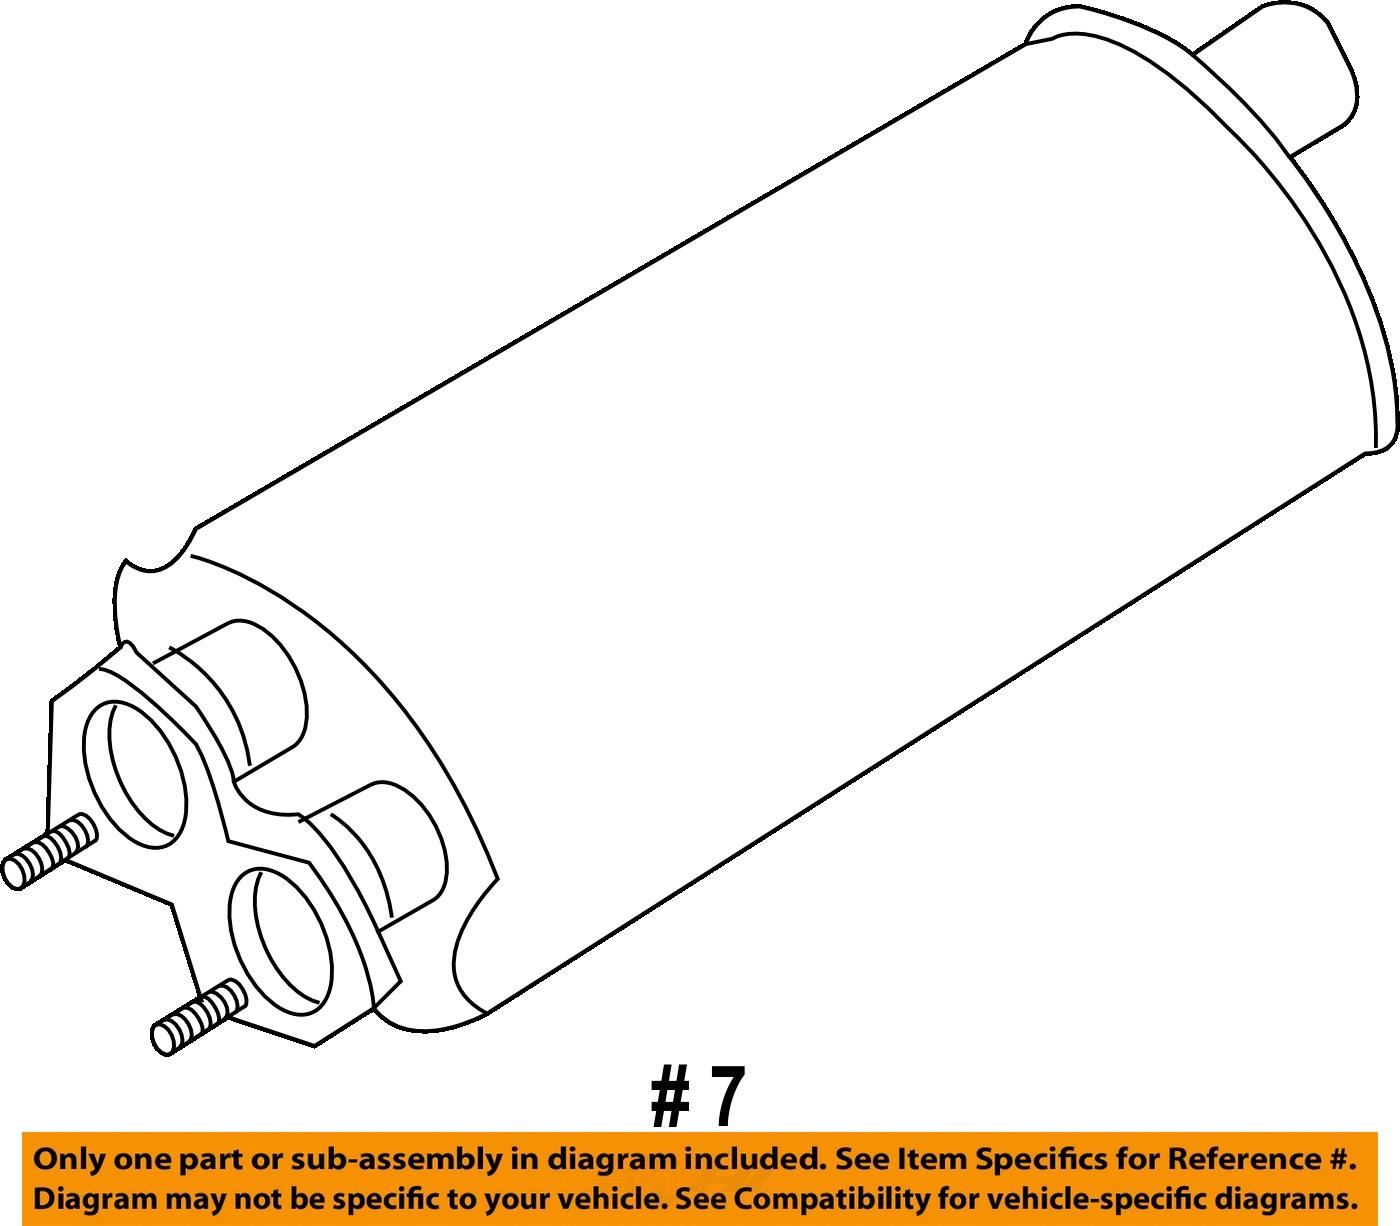 2007 Volvo Xc90 Exhaust Diagram Wiring Diagrams Engine Brand New Oem Front System Muffler 2014 2004 Oxygen Sensor Location